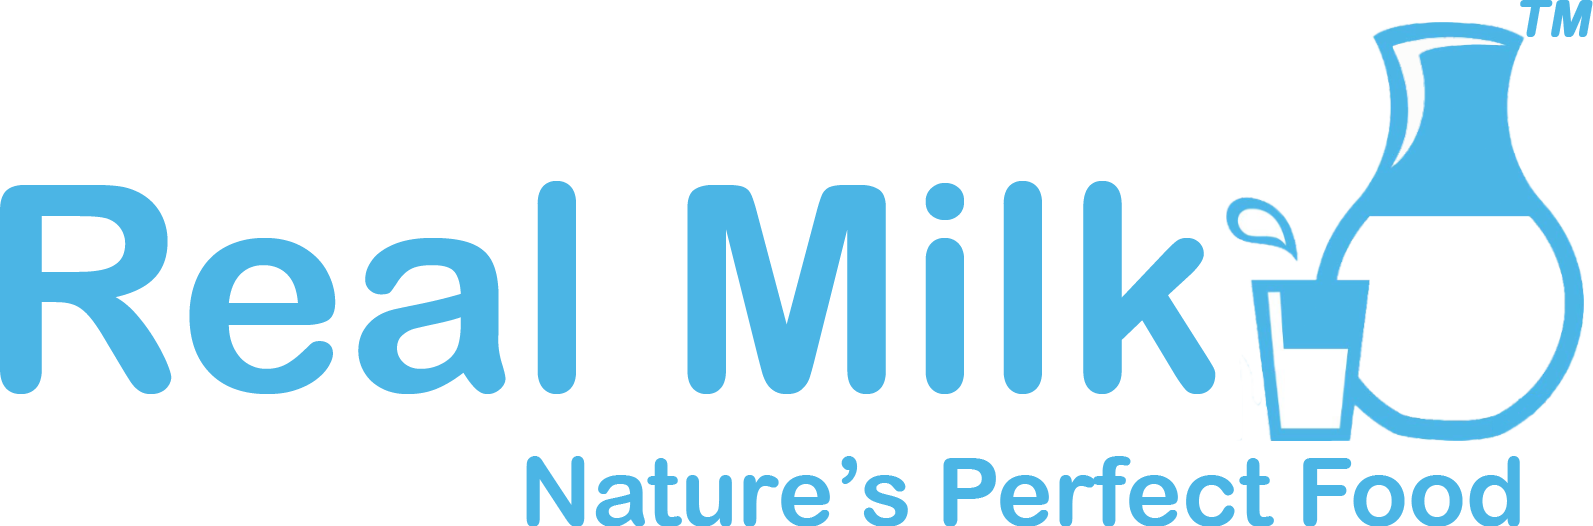 5xx Error Milk companies, Dairy business, Creative logo